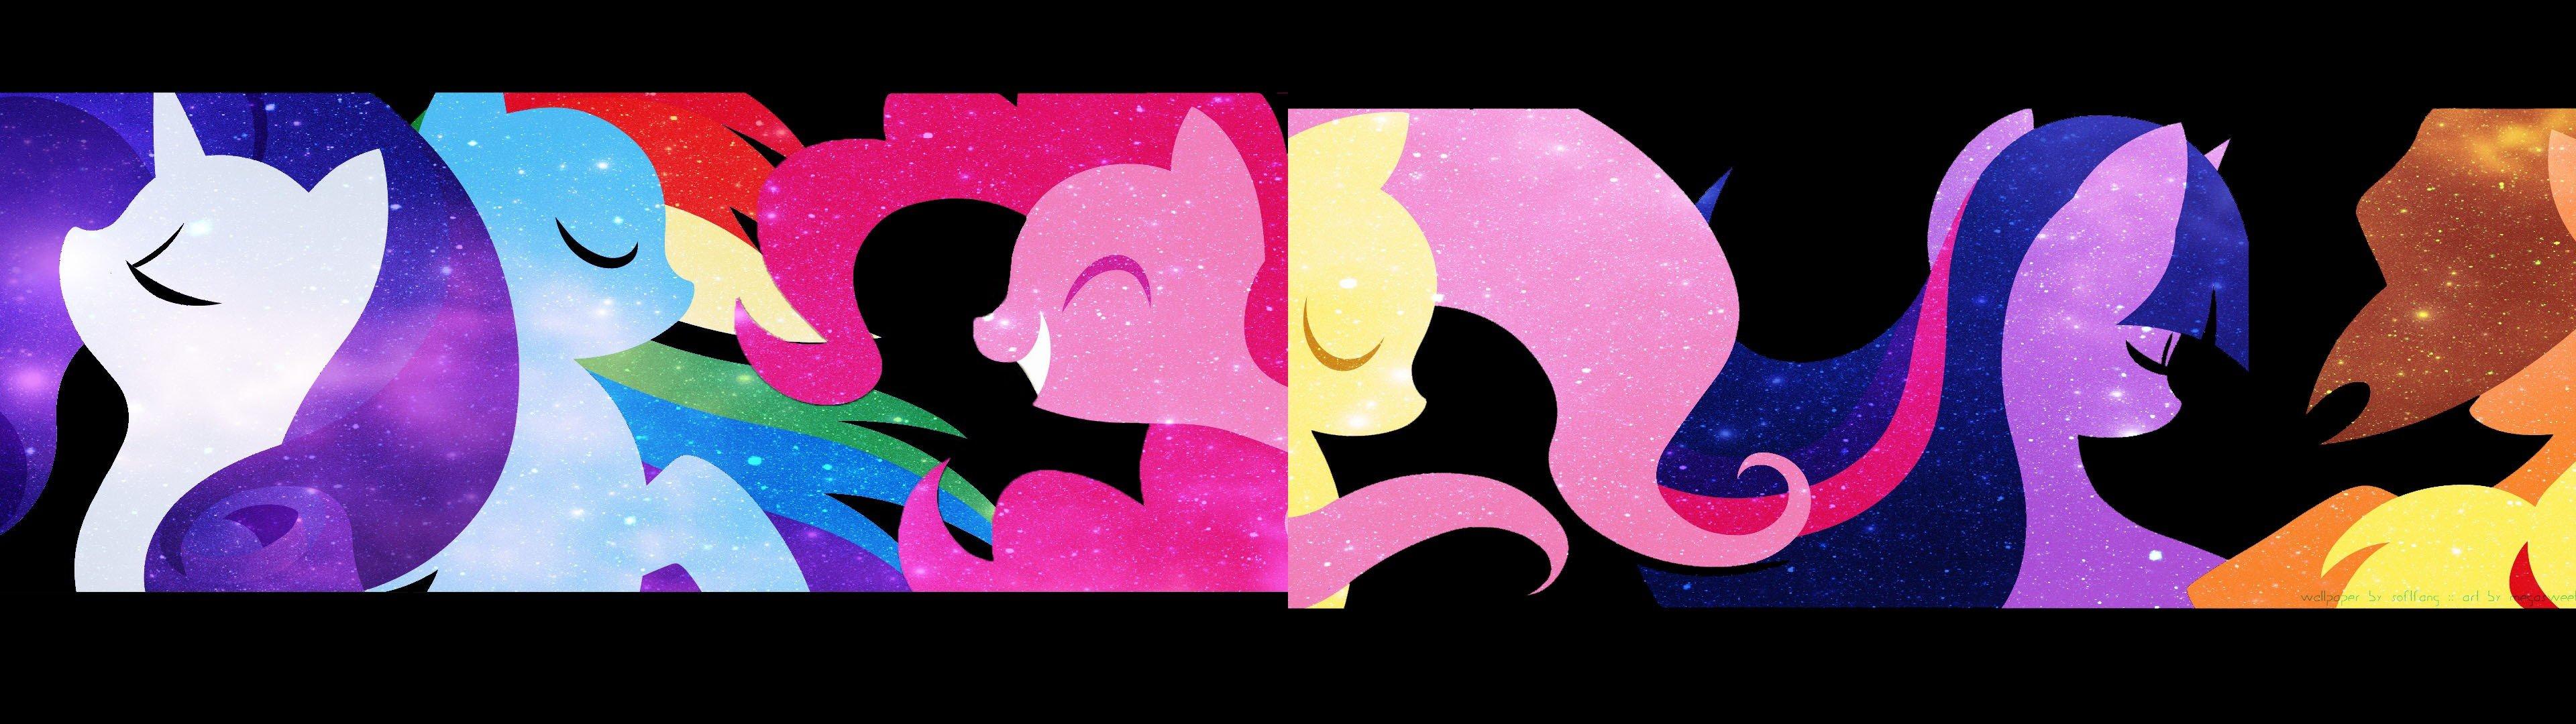 Rainbow dash and fluttershy wallpaper hd